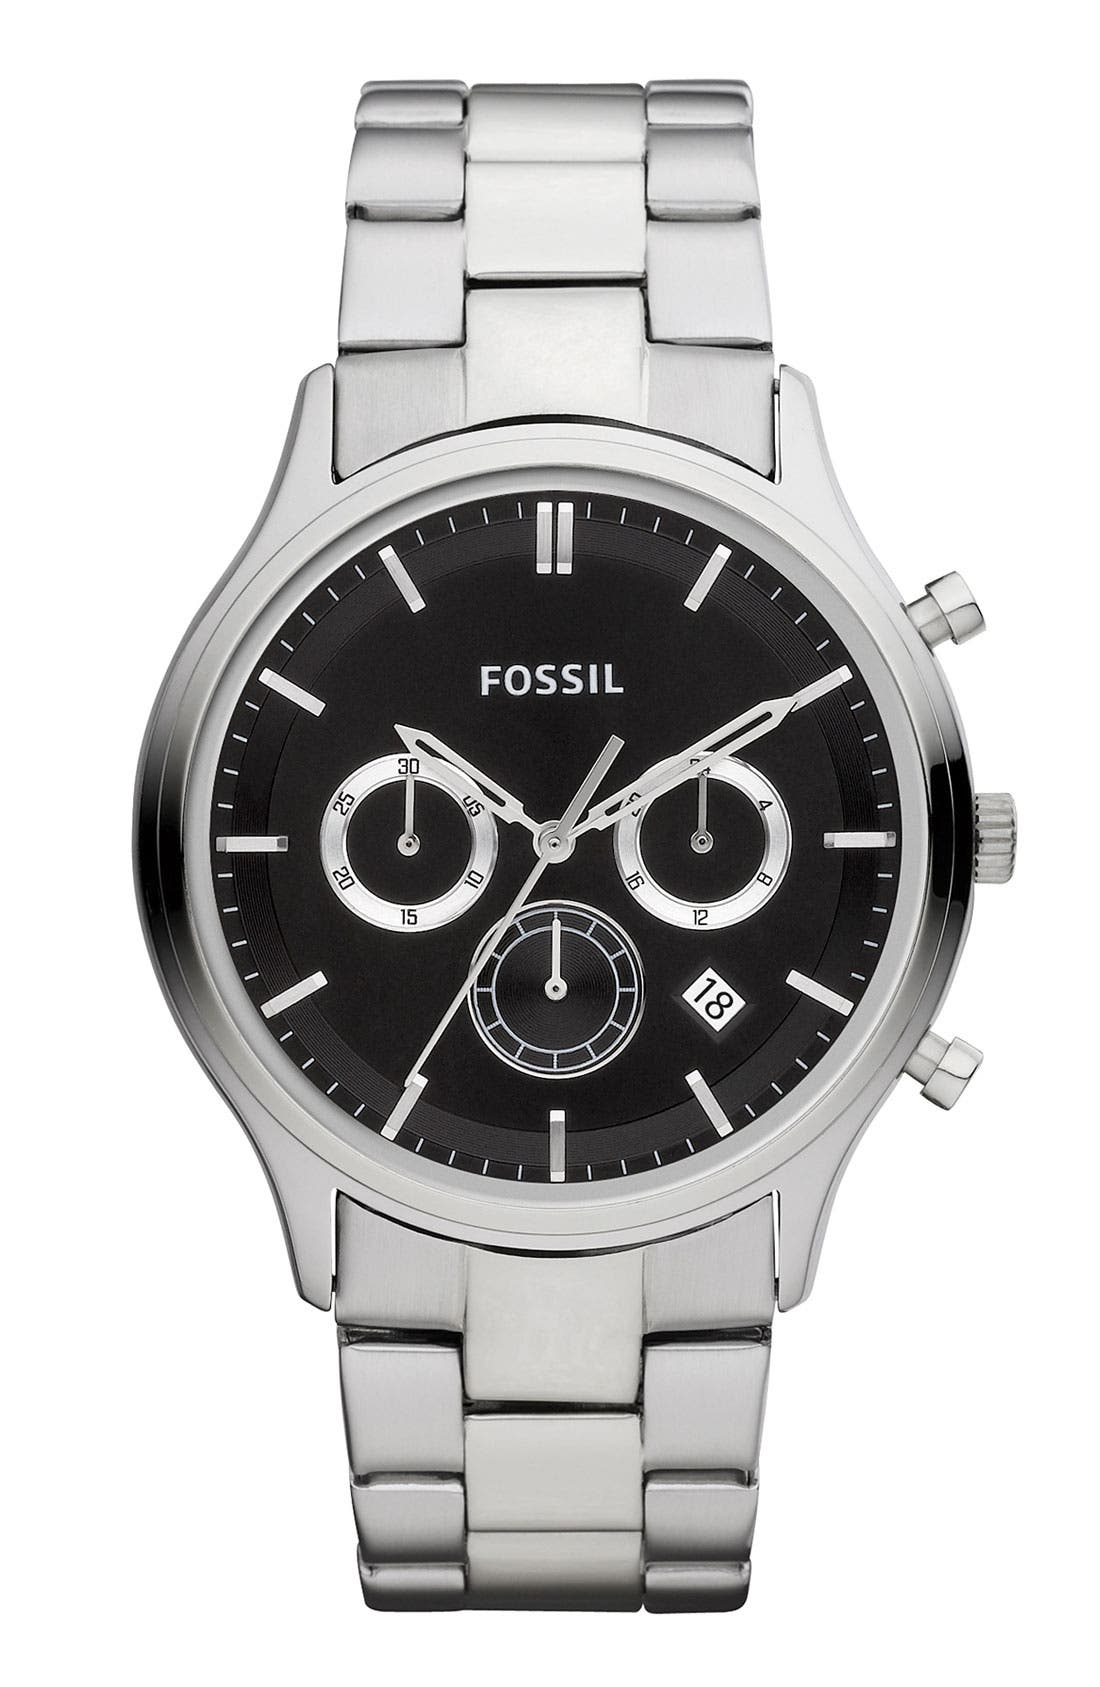 Main Image - Fossil 'Ansel' Chronograph Bracelet Watch, 41mm